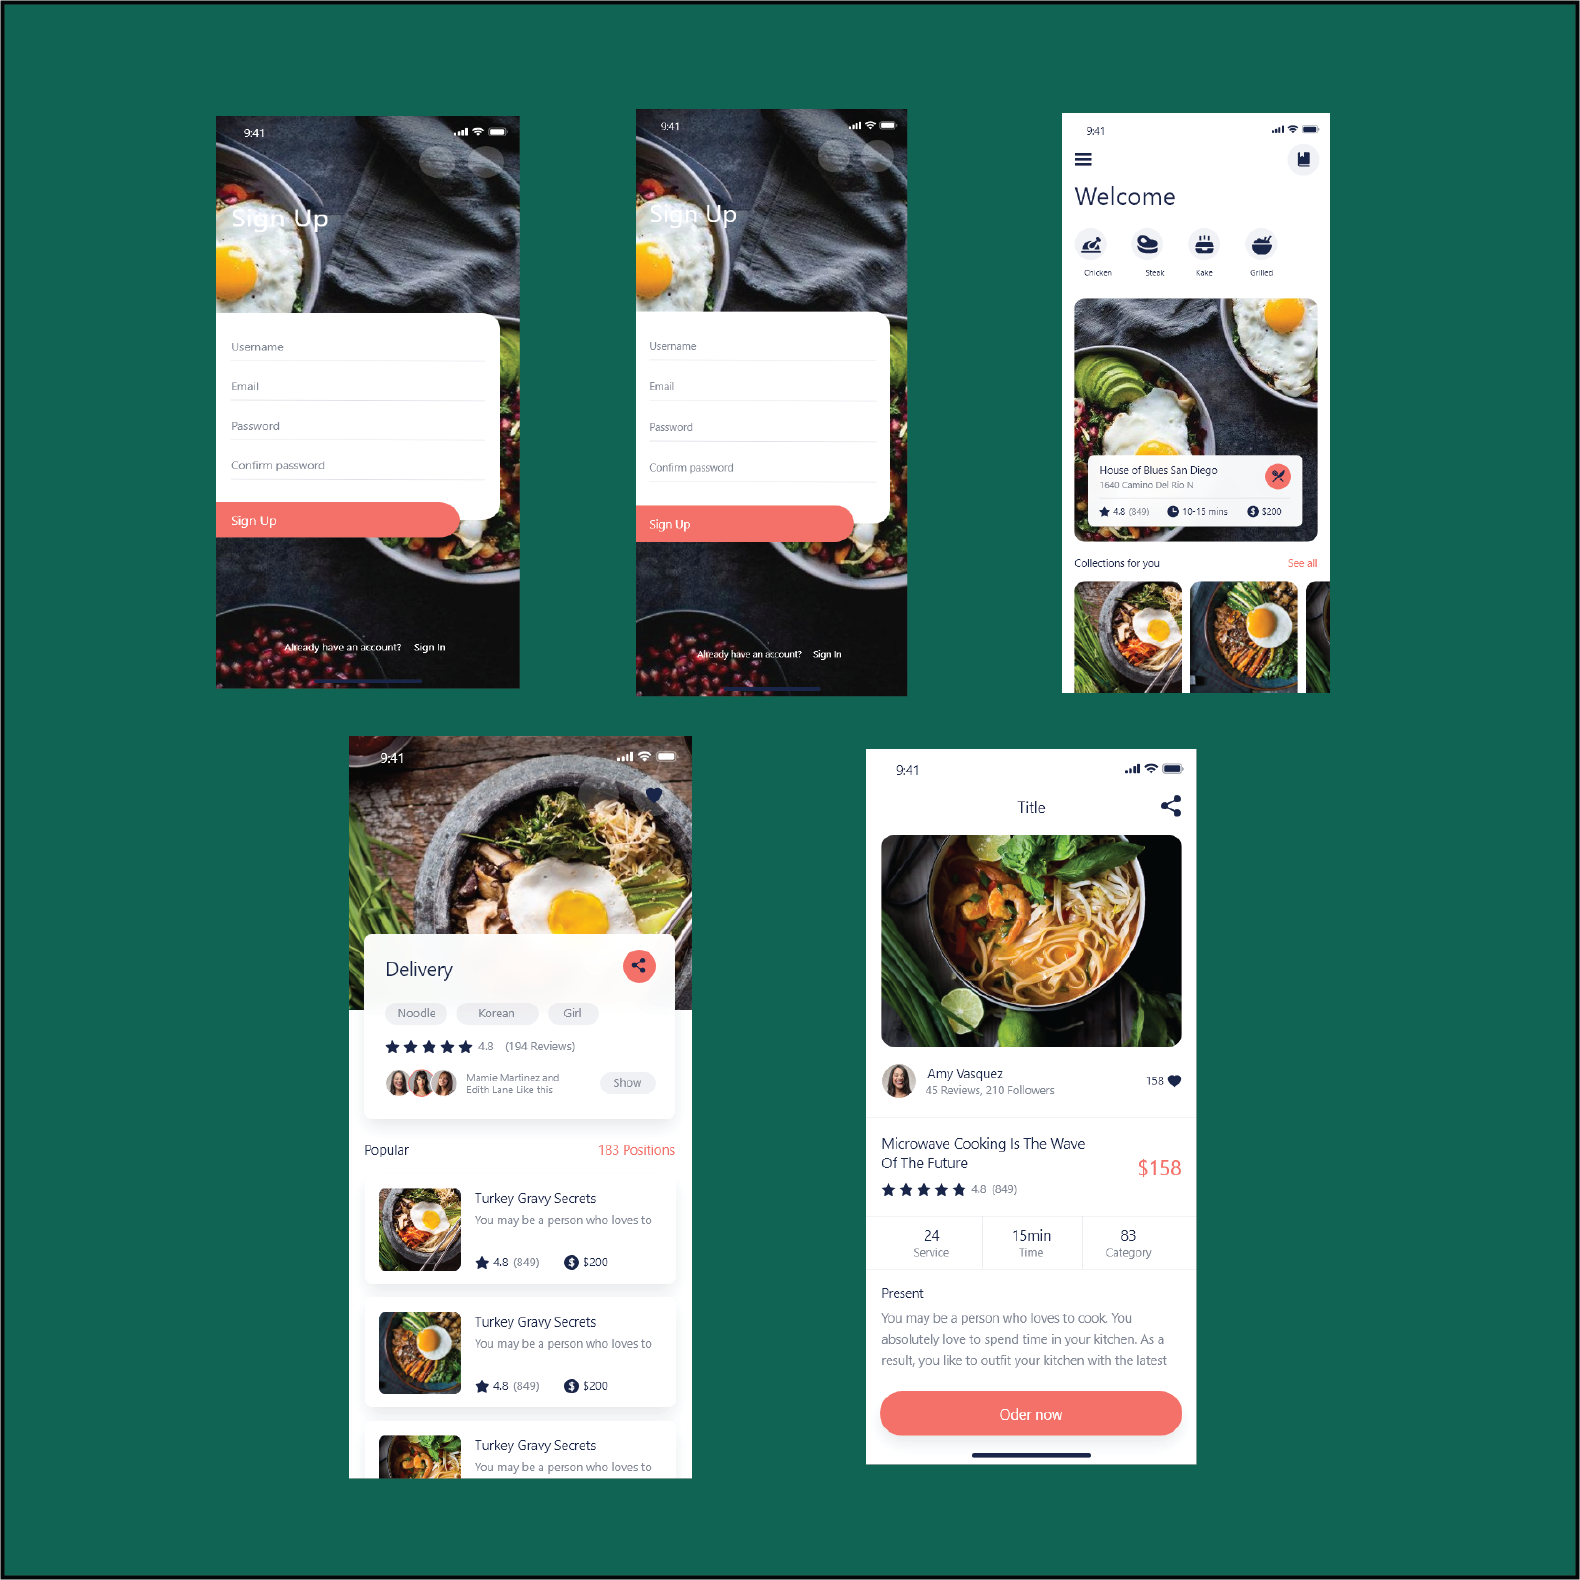 I will design website or mobile app ui mock up in adobe xd